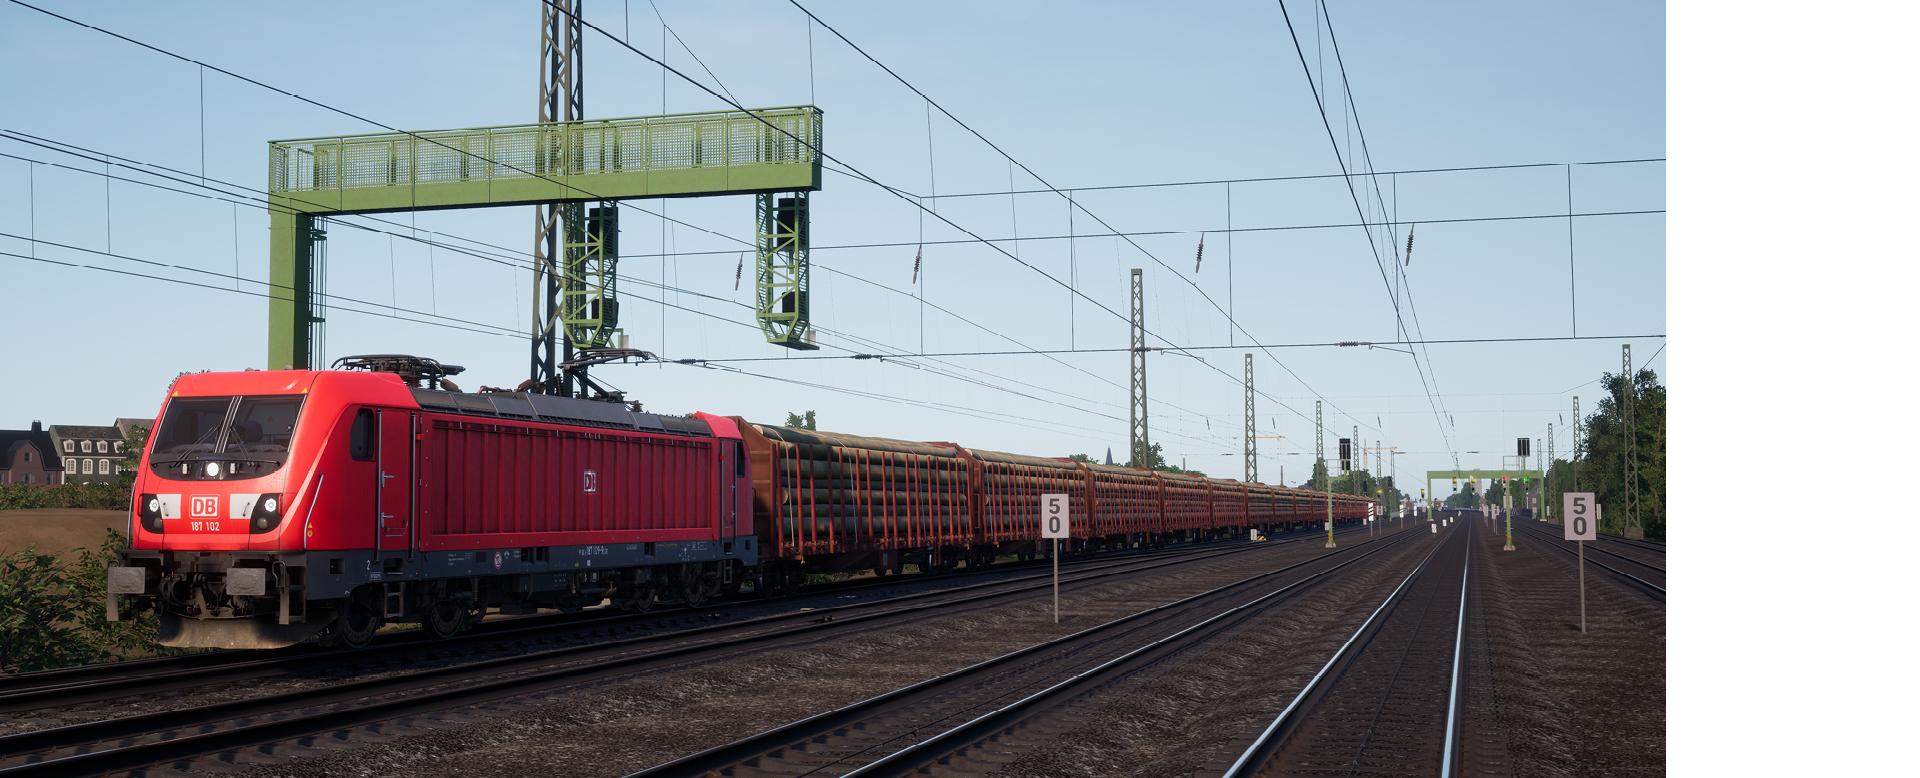 DB BR 187